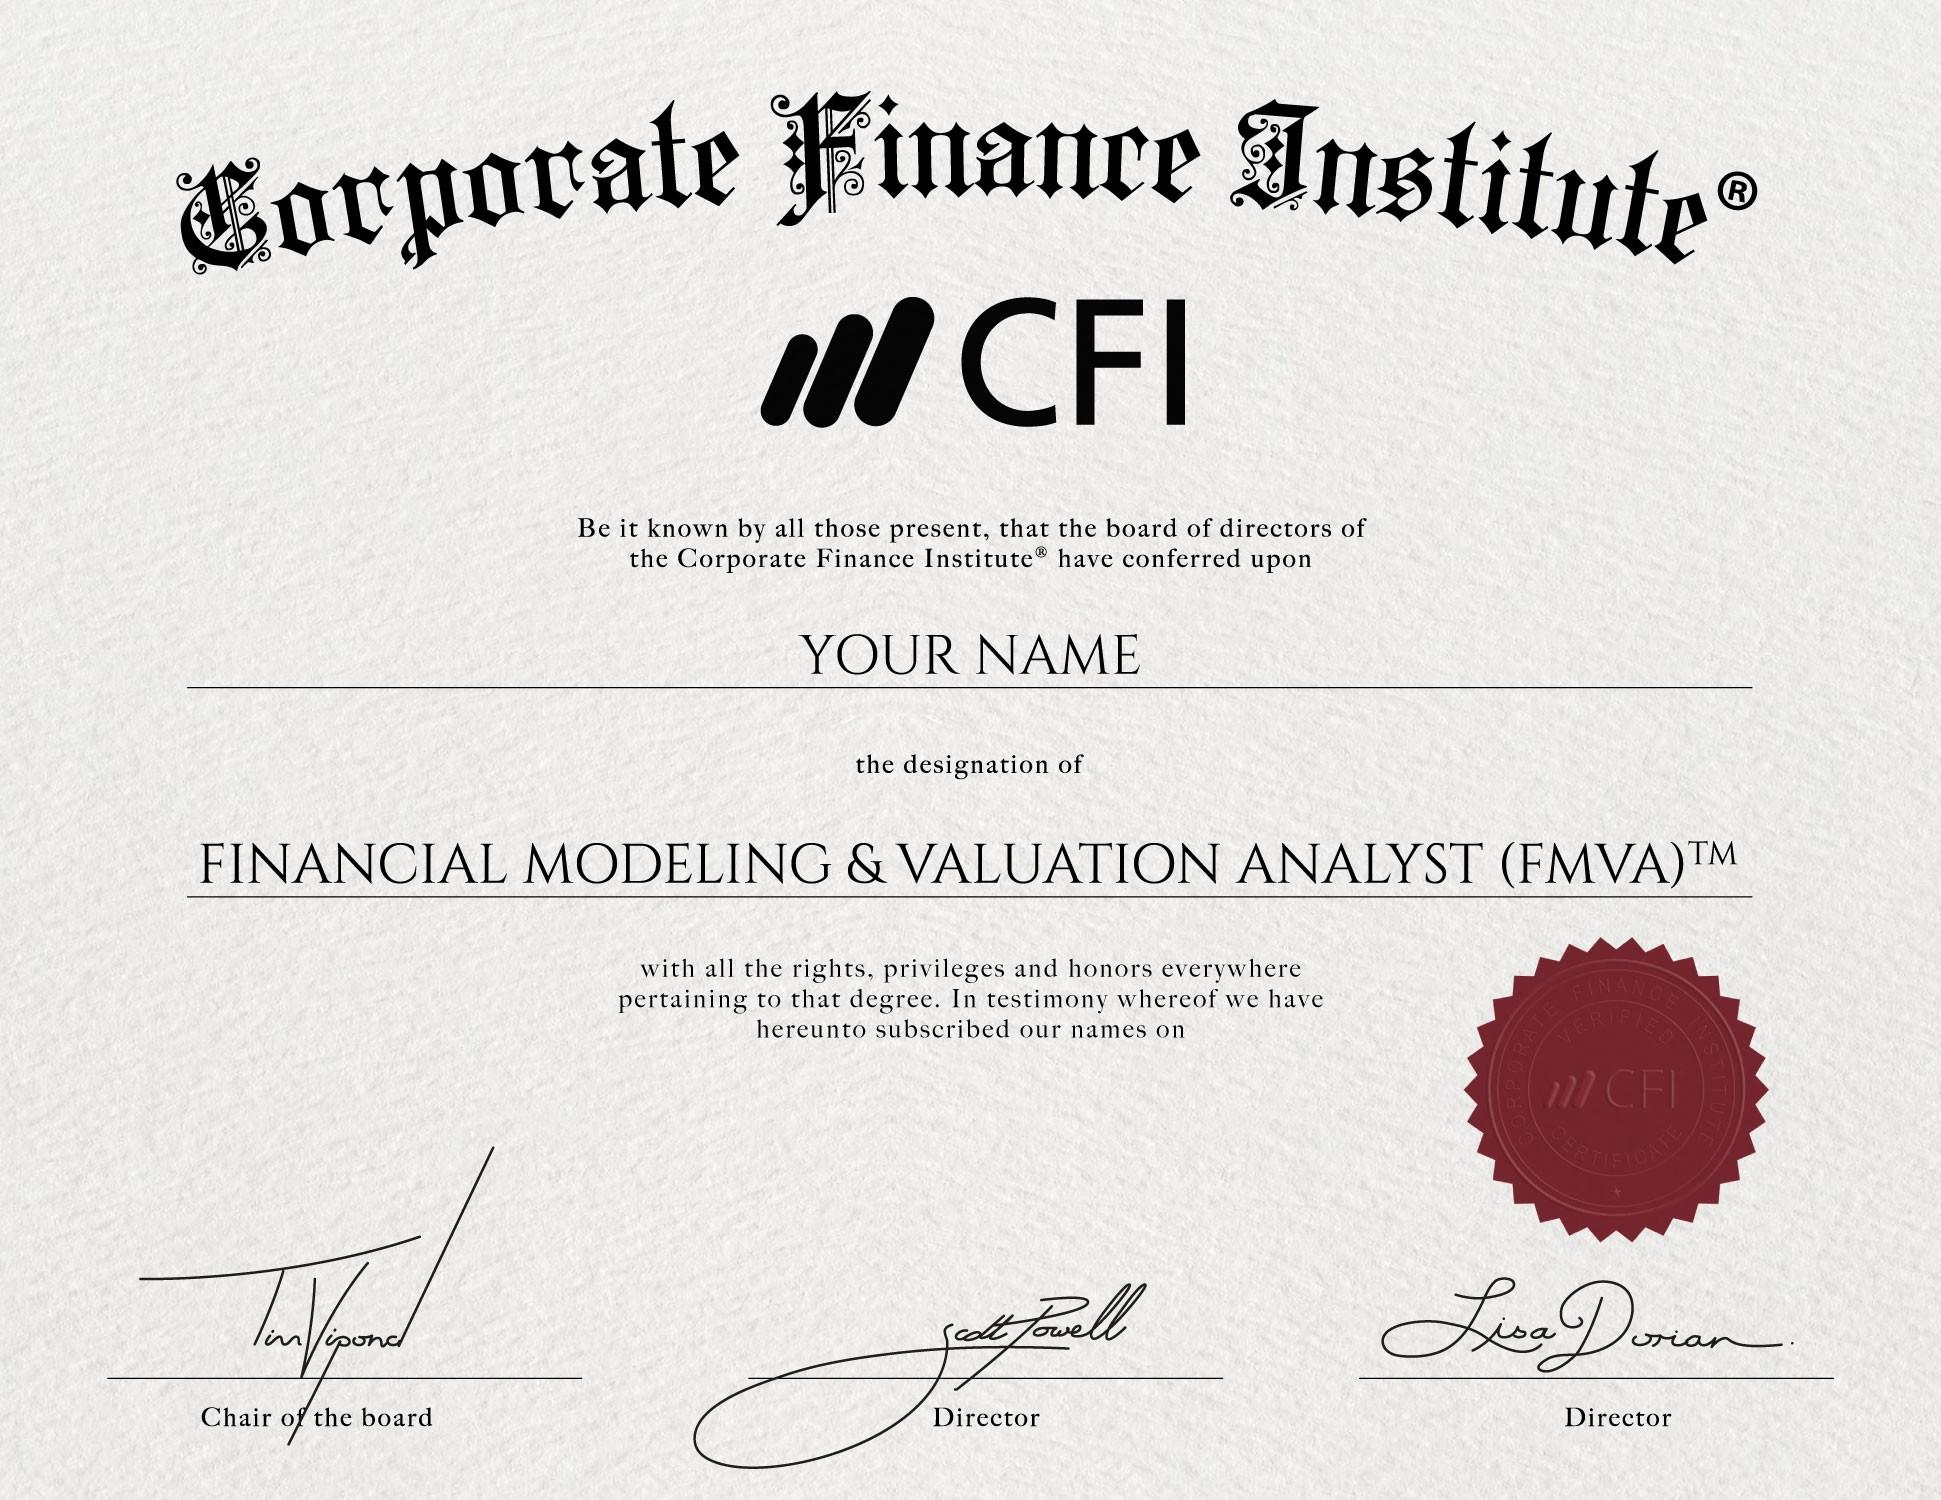 Financial Modeling & Valuation Analyst (FMVA)® Certification | LinkedIn